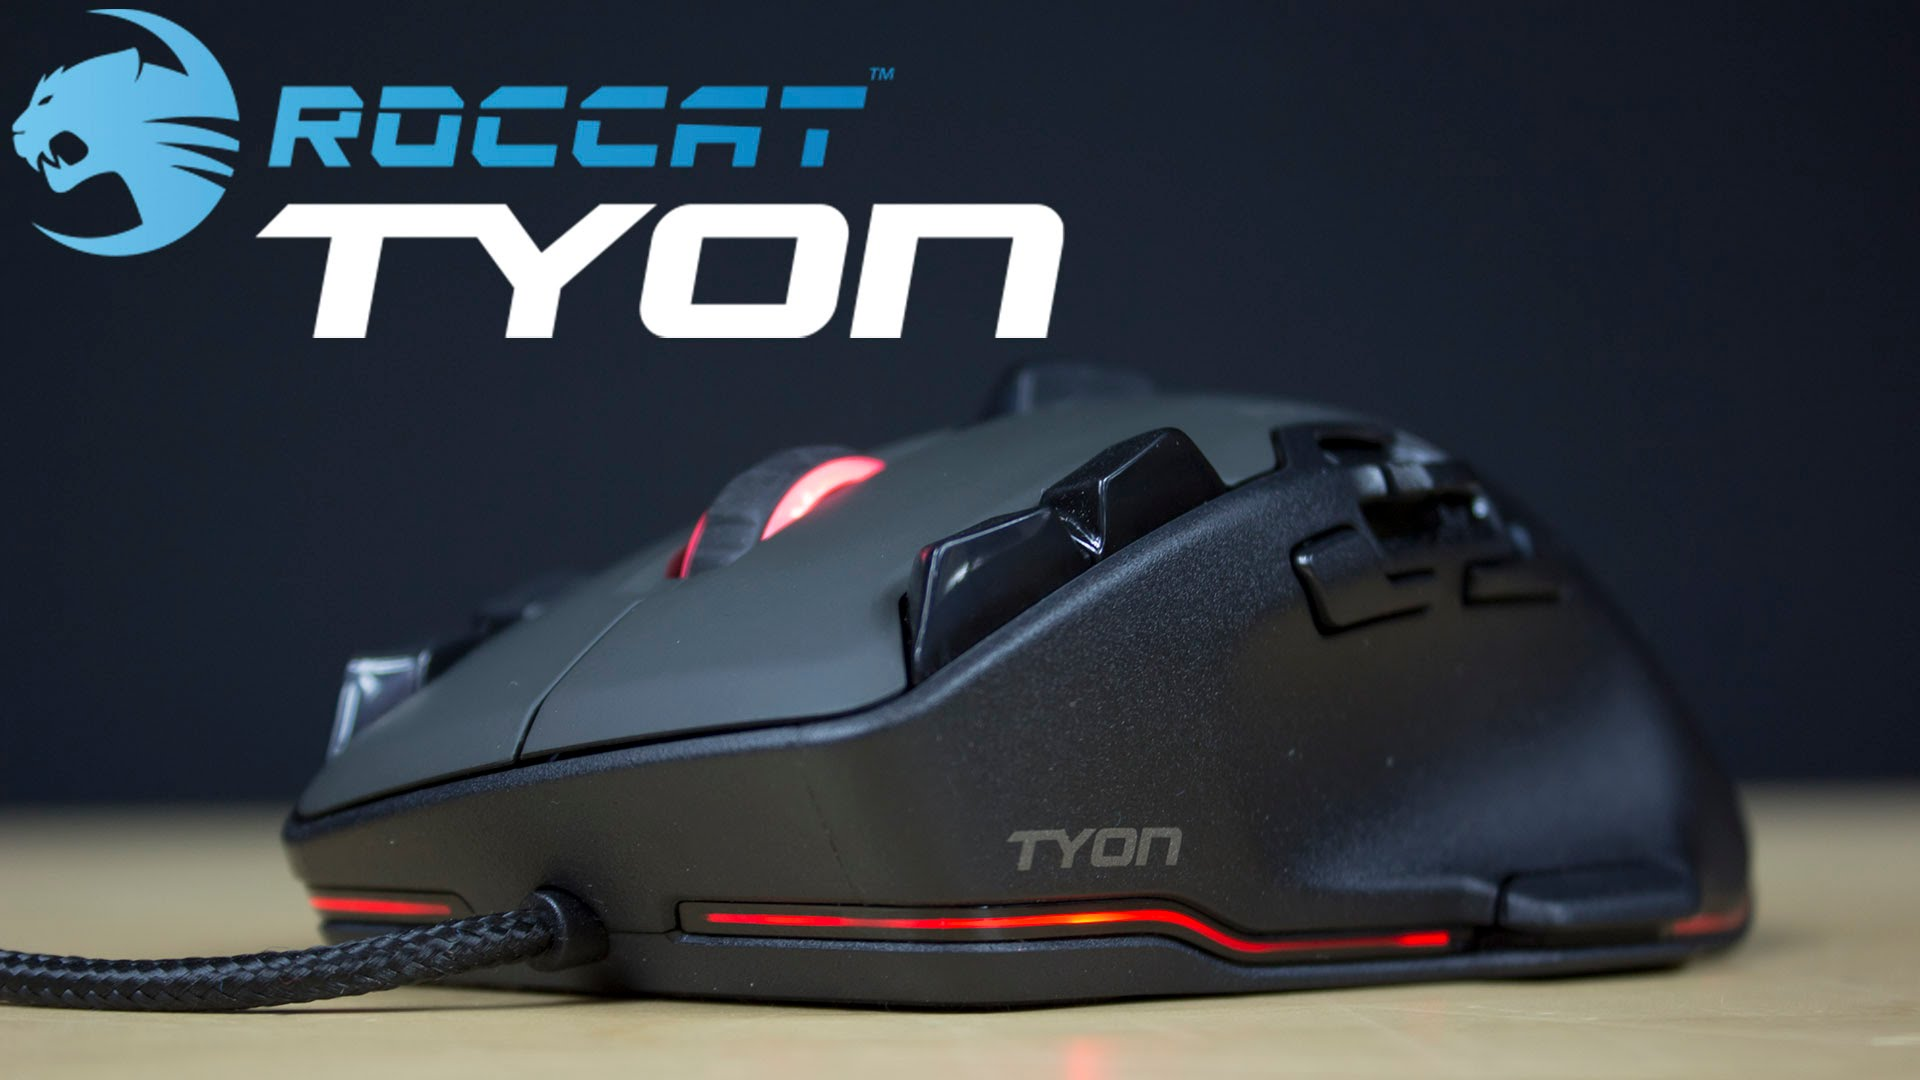 Roccat Tyon design